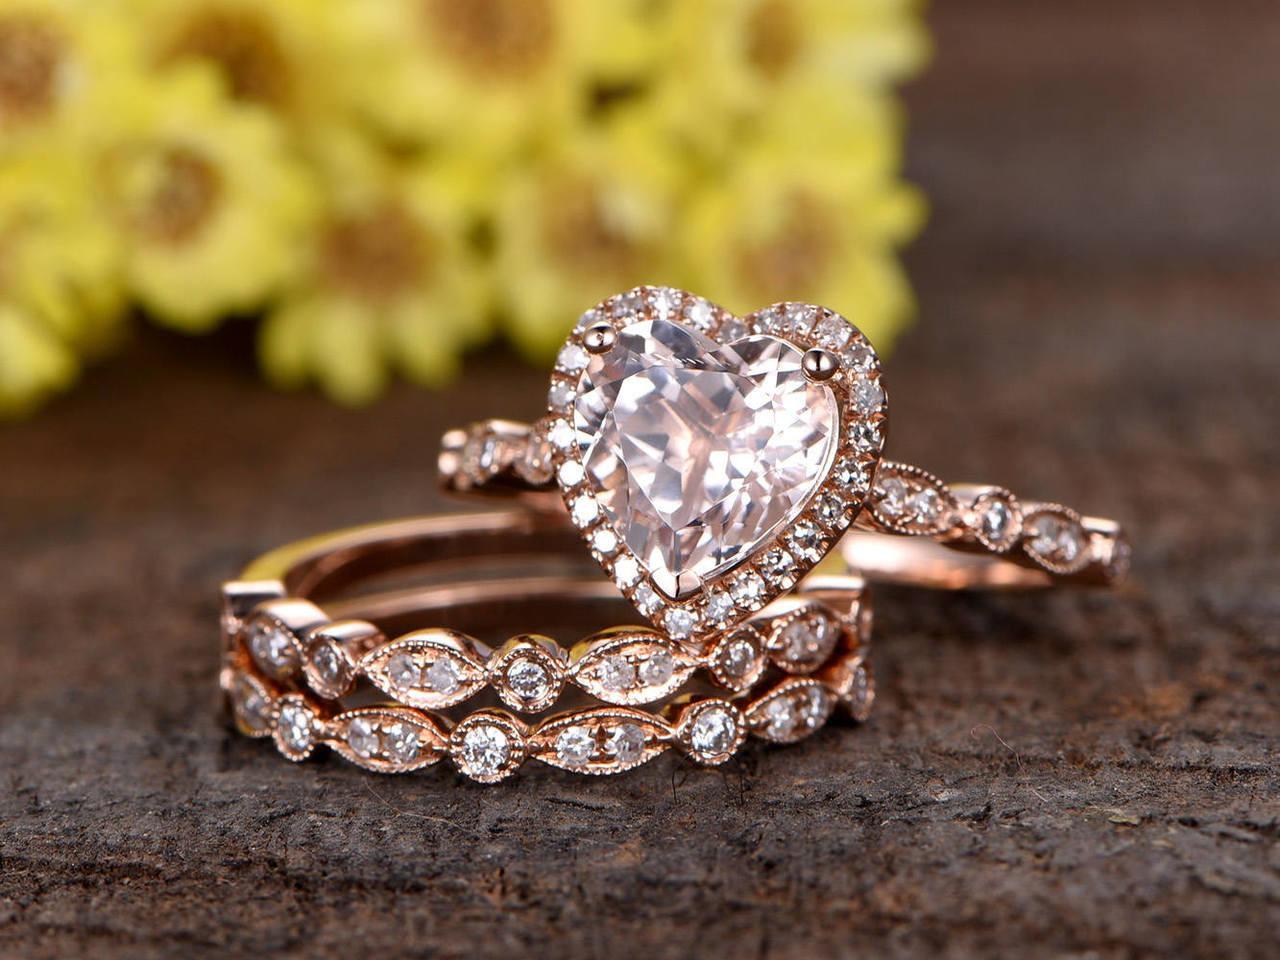 7mm heart shaped pink Morganite engagement ring set 84fe1f51d9